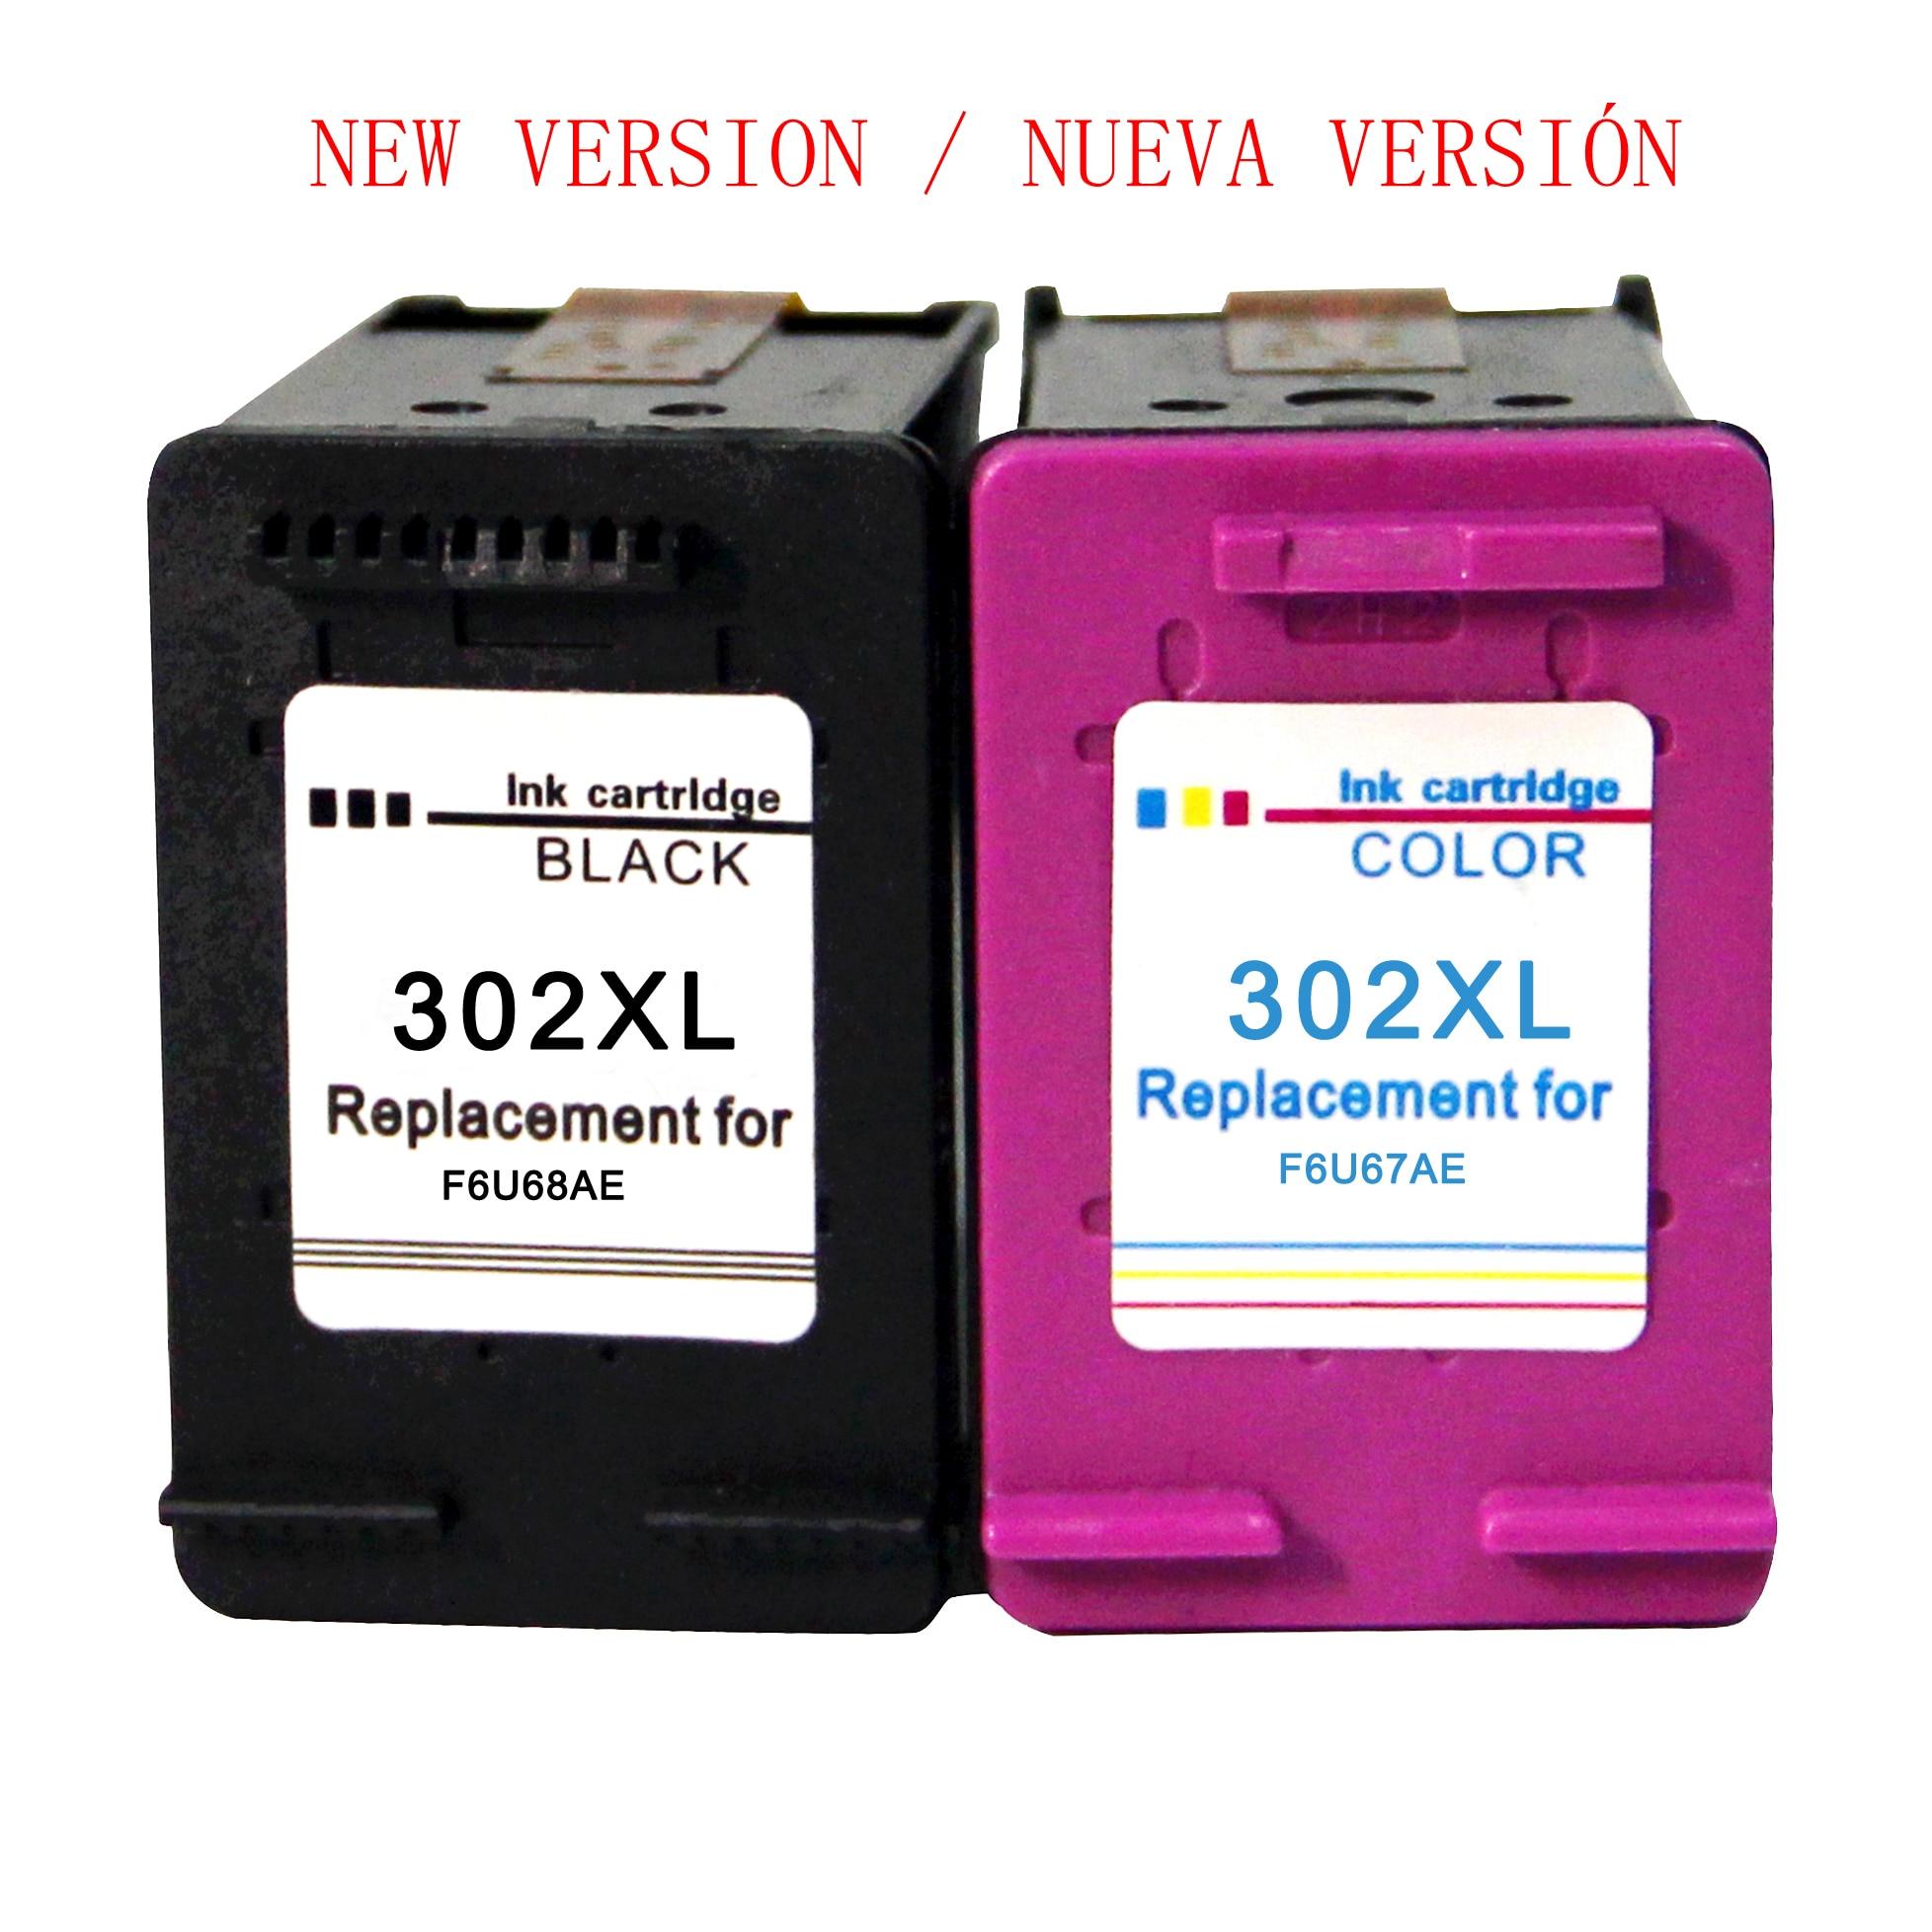 Compatible 302XL Cartuchos de tinta para HP 302 para HP OfficeJet 5220 5222 5230 5232 3831 3833 Envy 4520 4524  DeskJet 3639